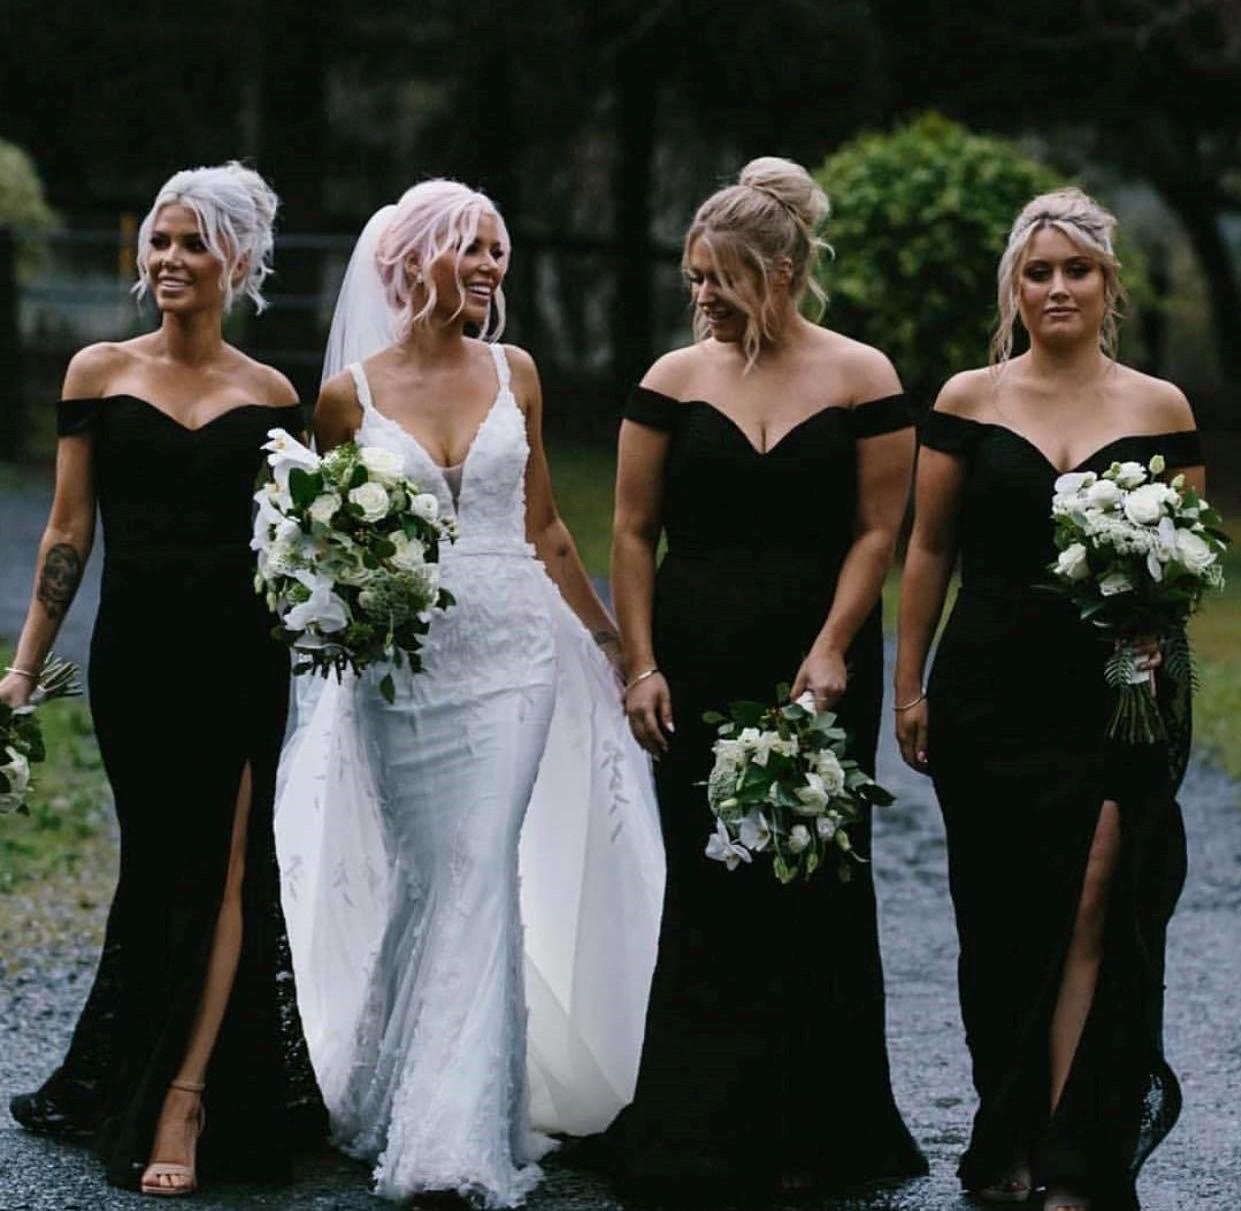 Modern Bridesmaid Dresses Sydney Jadore Dresses Portia And Scarlett